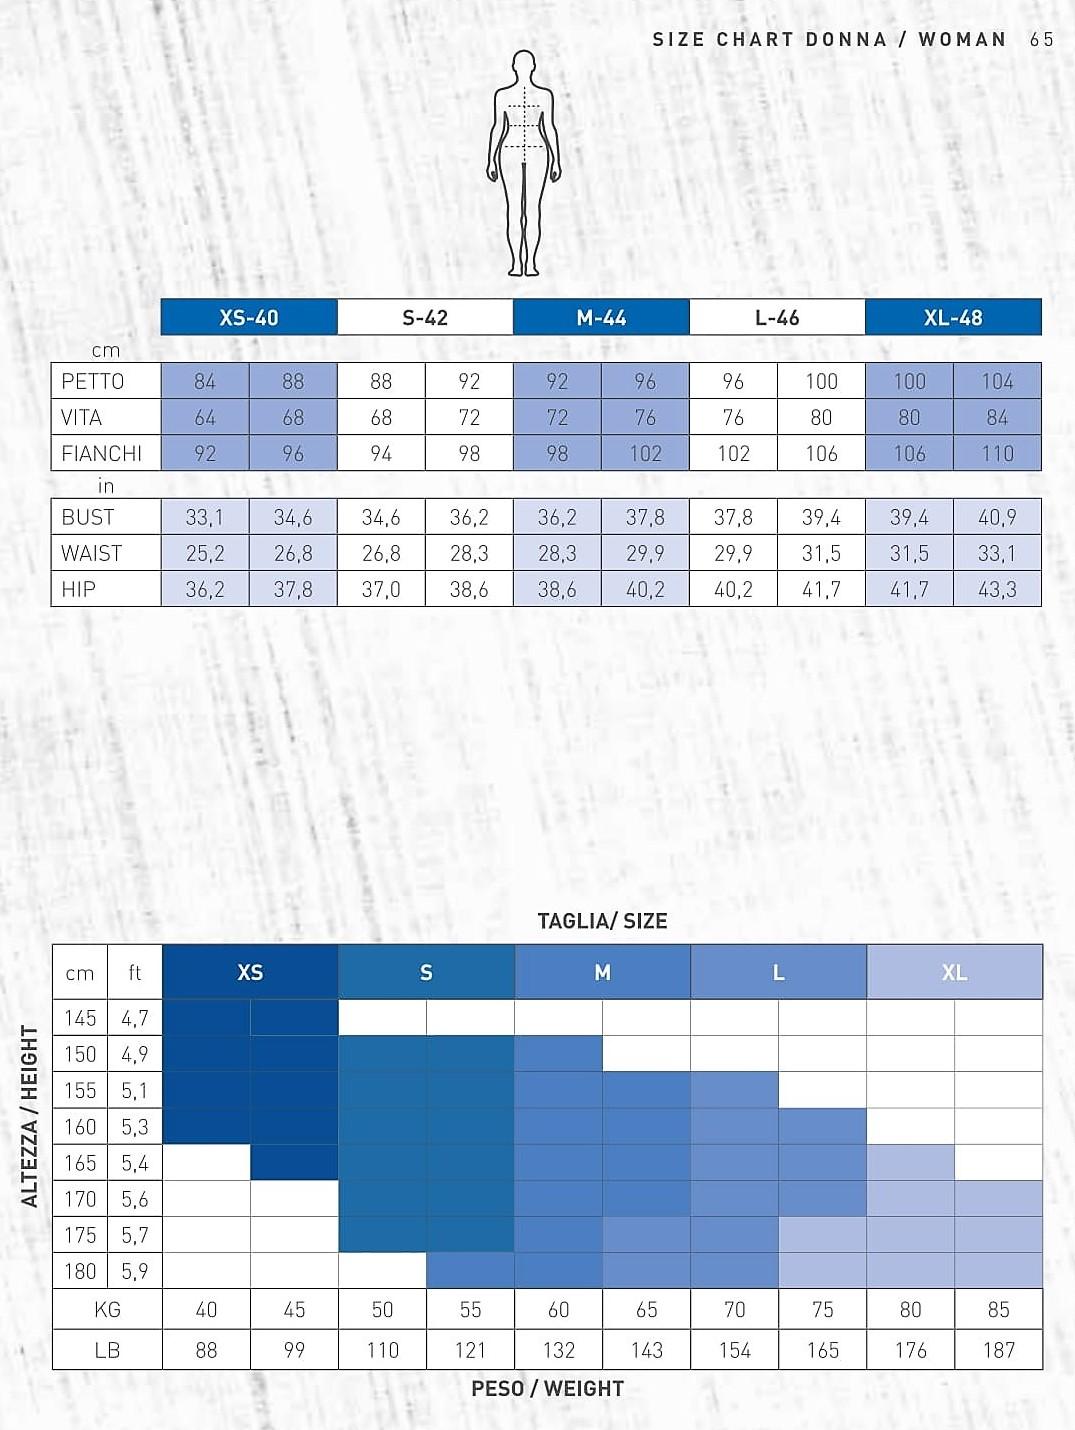 size charts- woman.jpg